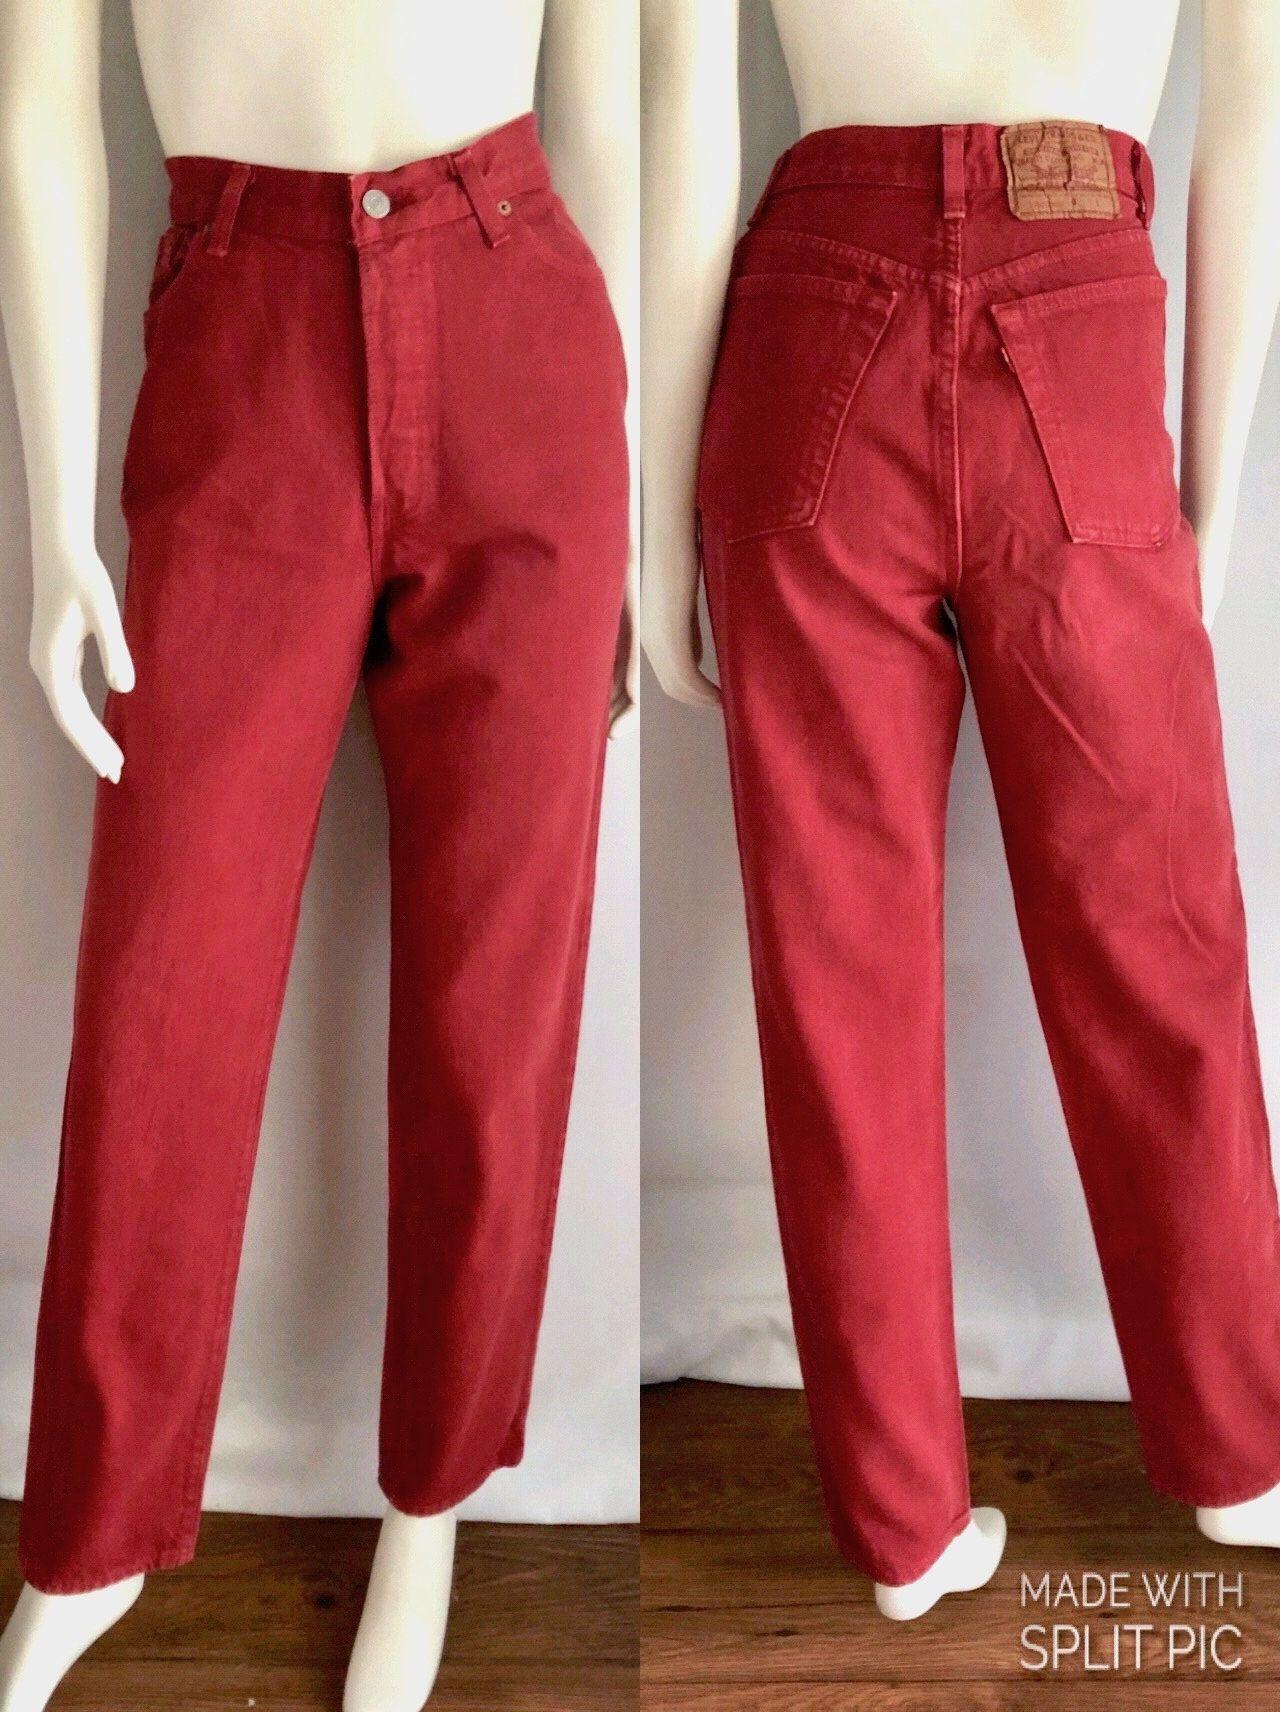 e78b30c3 Vintage Women's 80's Red, Levi's 501, Jeans, High Waisted, Straight Leg,  Denim (L) by Freshandswanky on Etsy